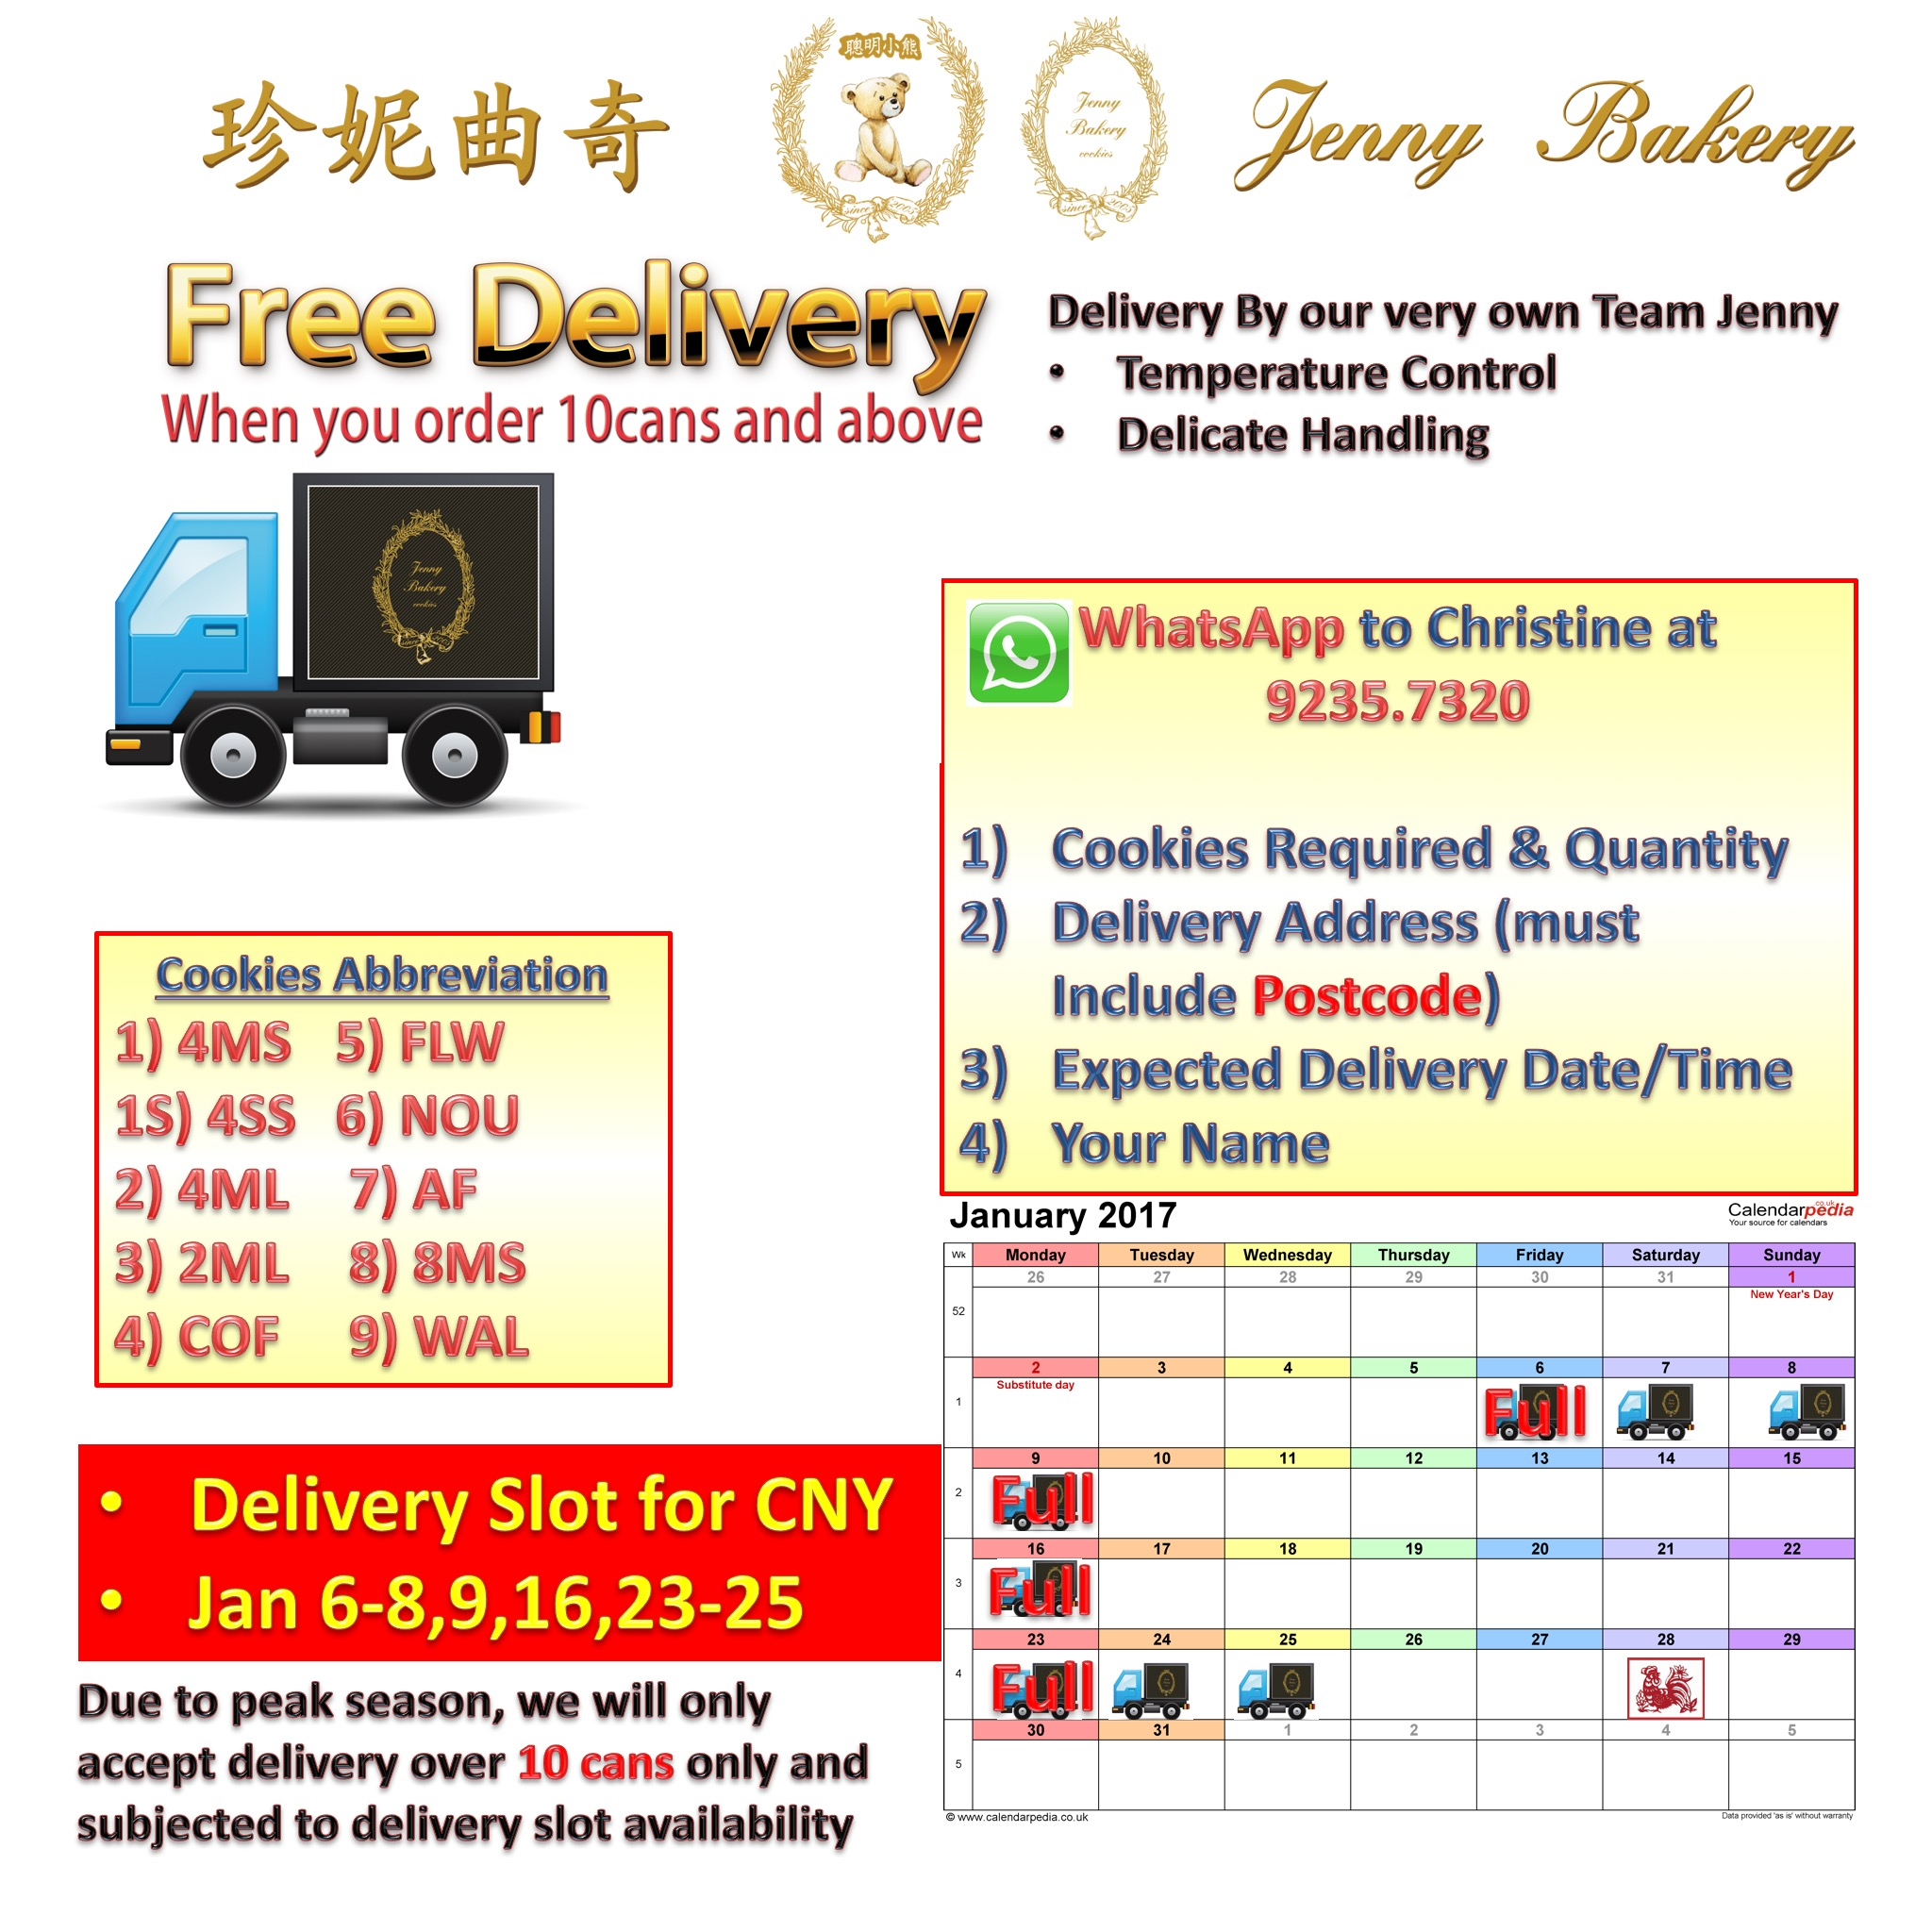 http://www.jennybakery.sg/sg/deliver/